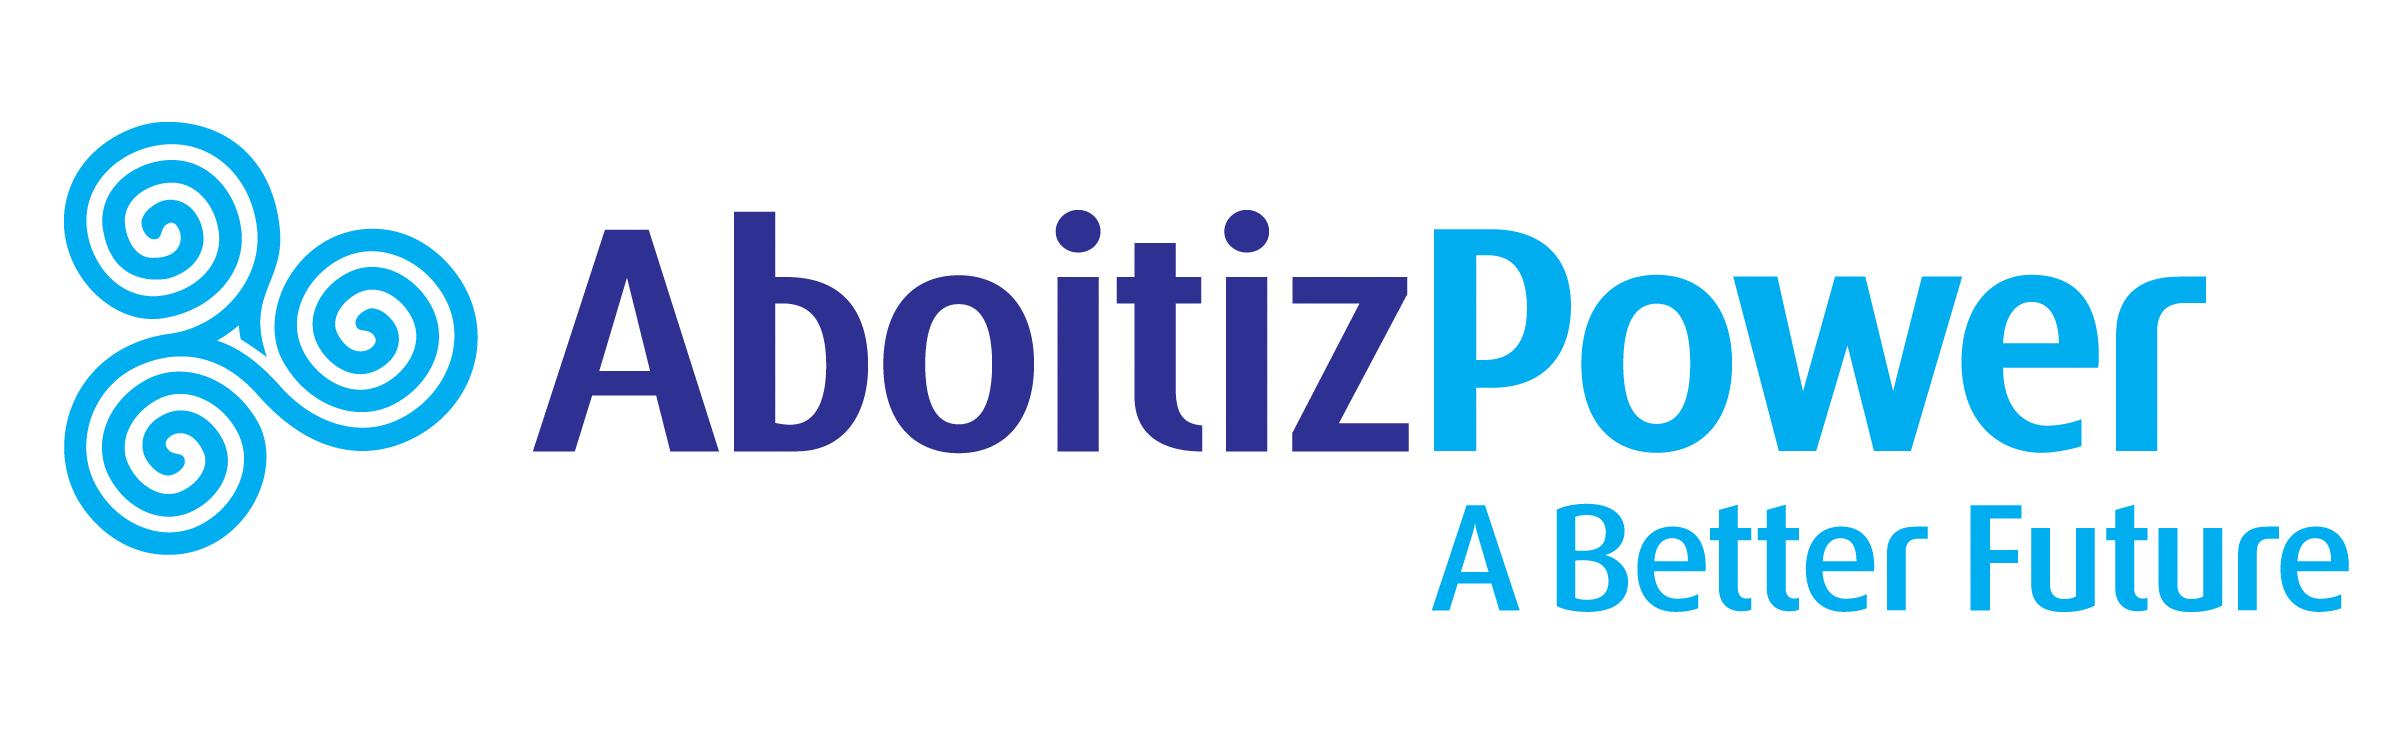 Aboitiz Power Generation Group